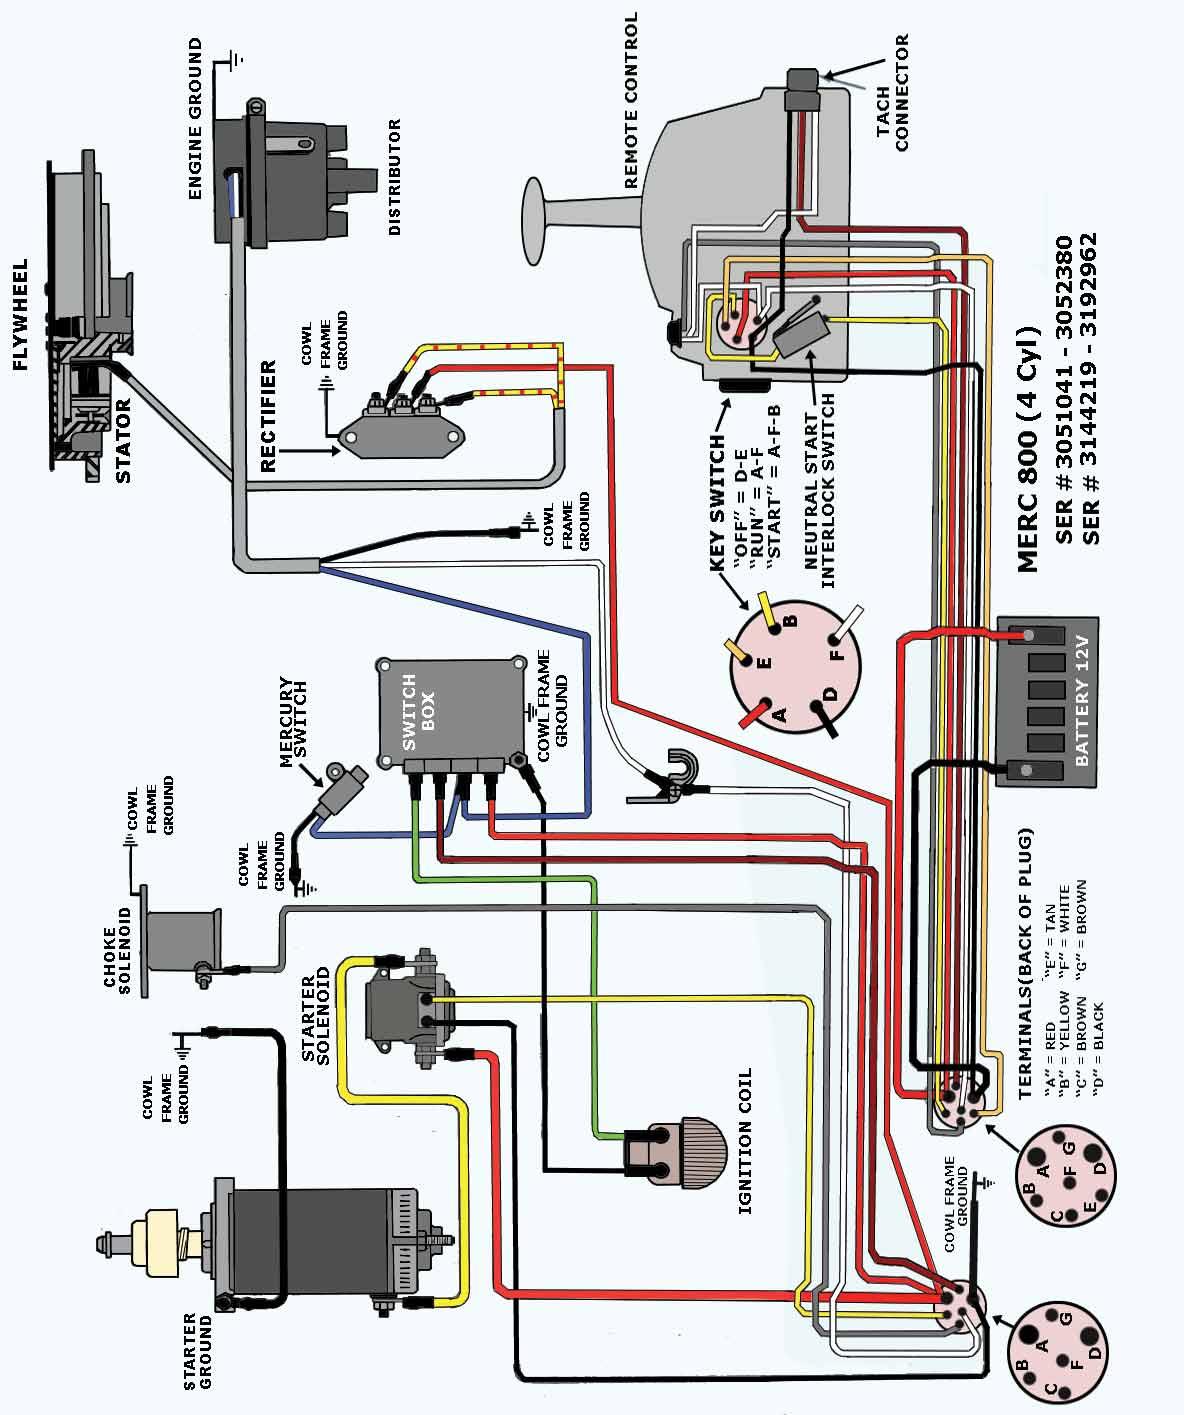 Pleasing Mercury Outboard Ignition Switch Wiring Diagram Wiring Diagram M6 Wiring Cloud Icalpermsplehendilmohammedshrineorg